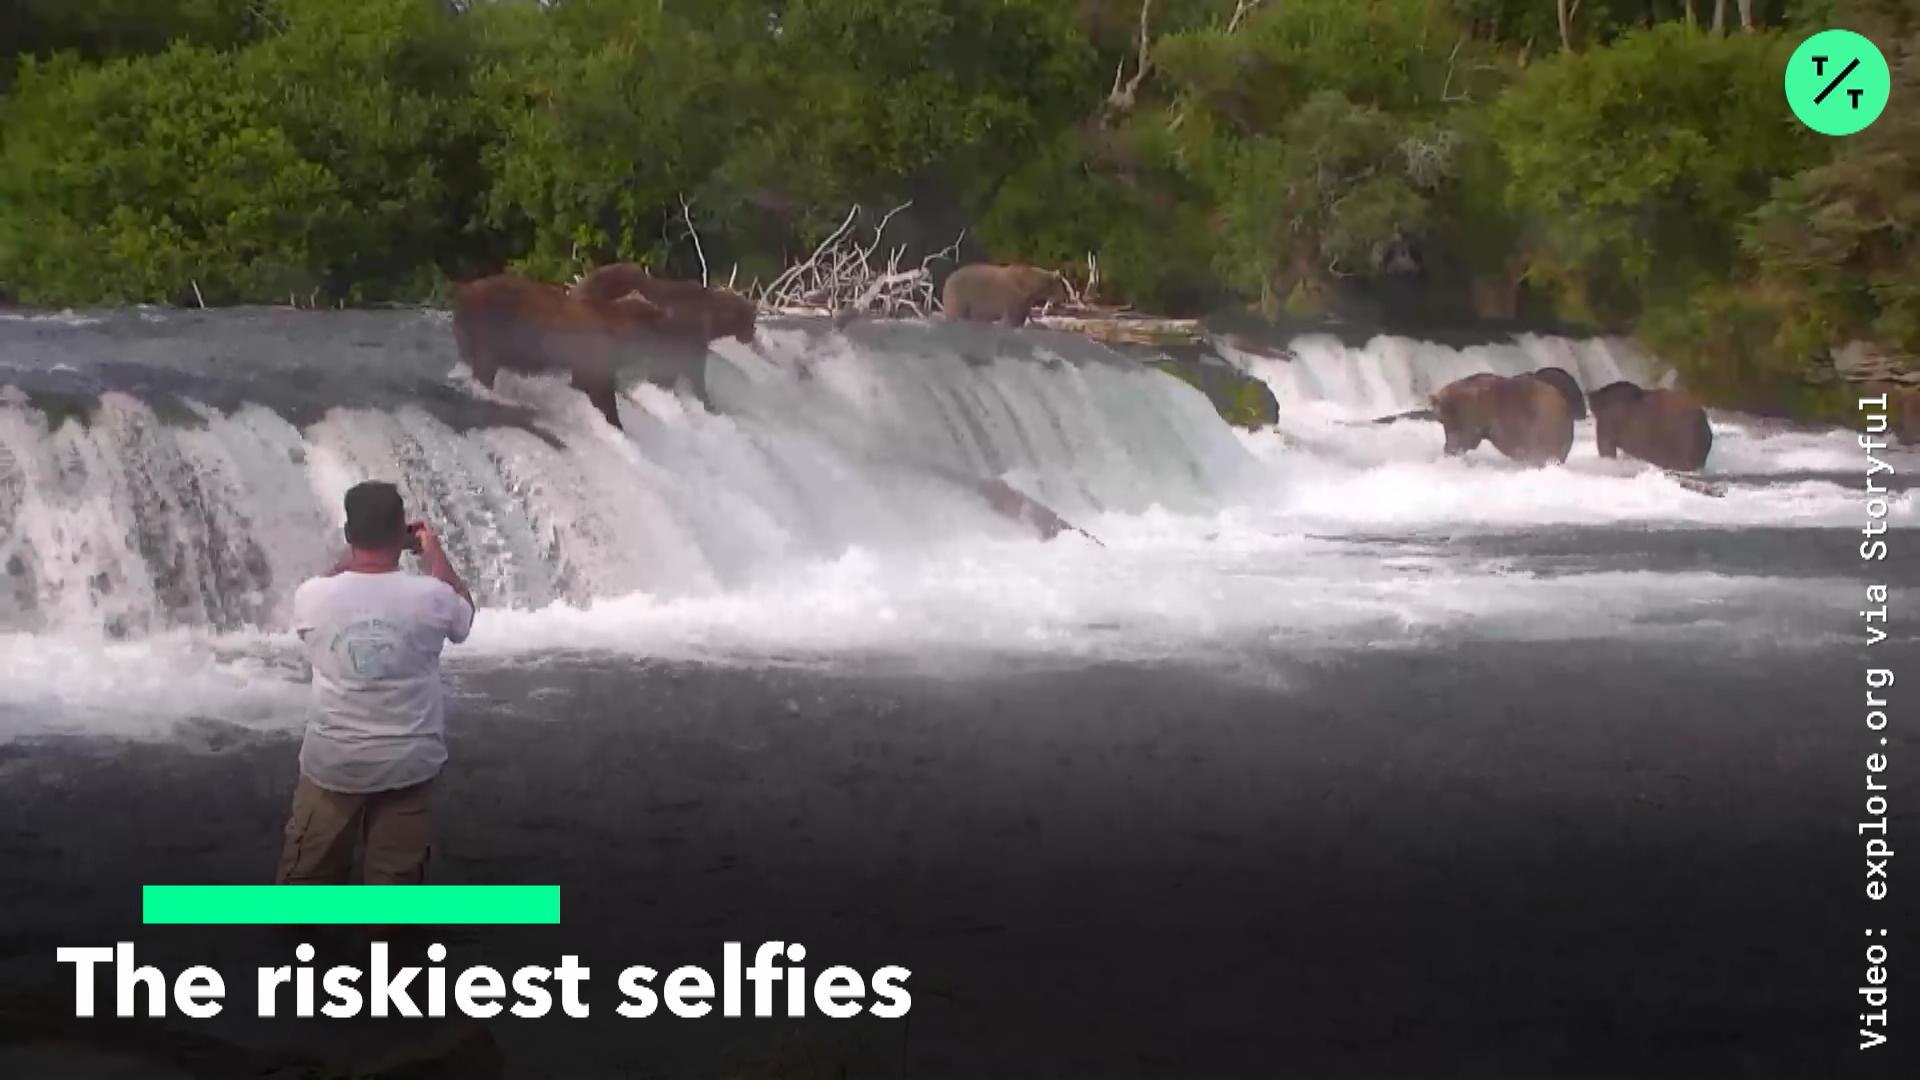 The Riskiest Selfies